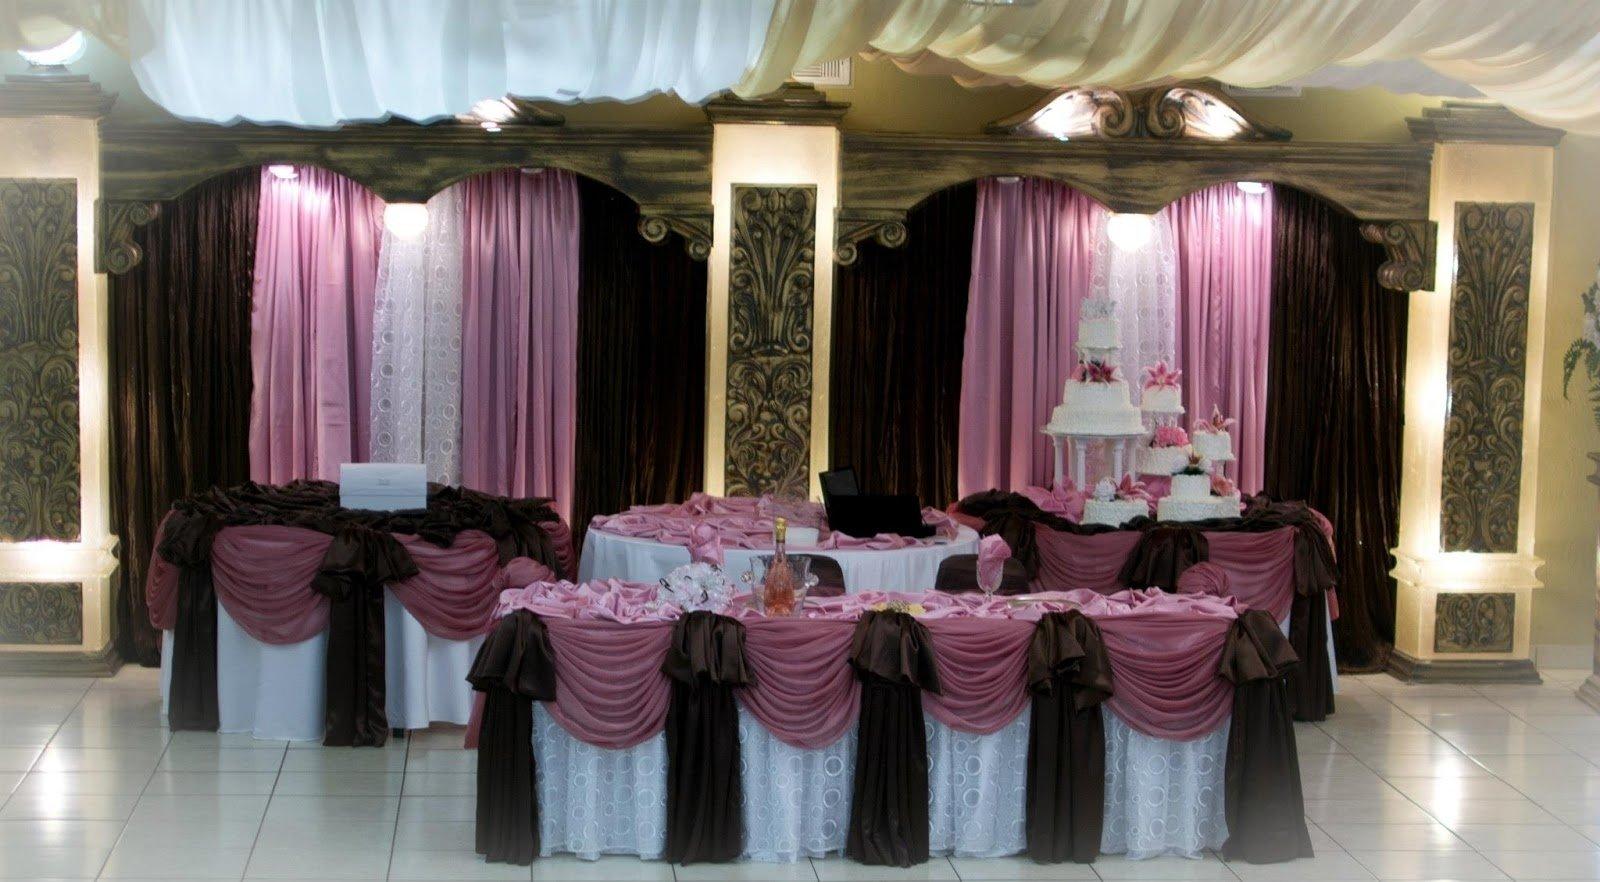 10 Fantastic Pink And Brown Wedding Ideas wedding ideas in december wedding ideas 2021